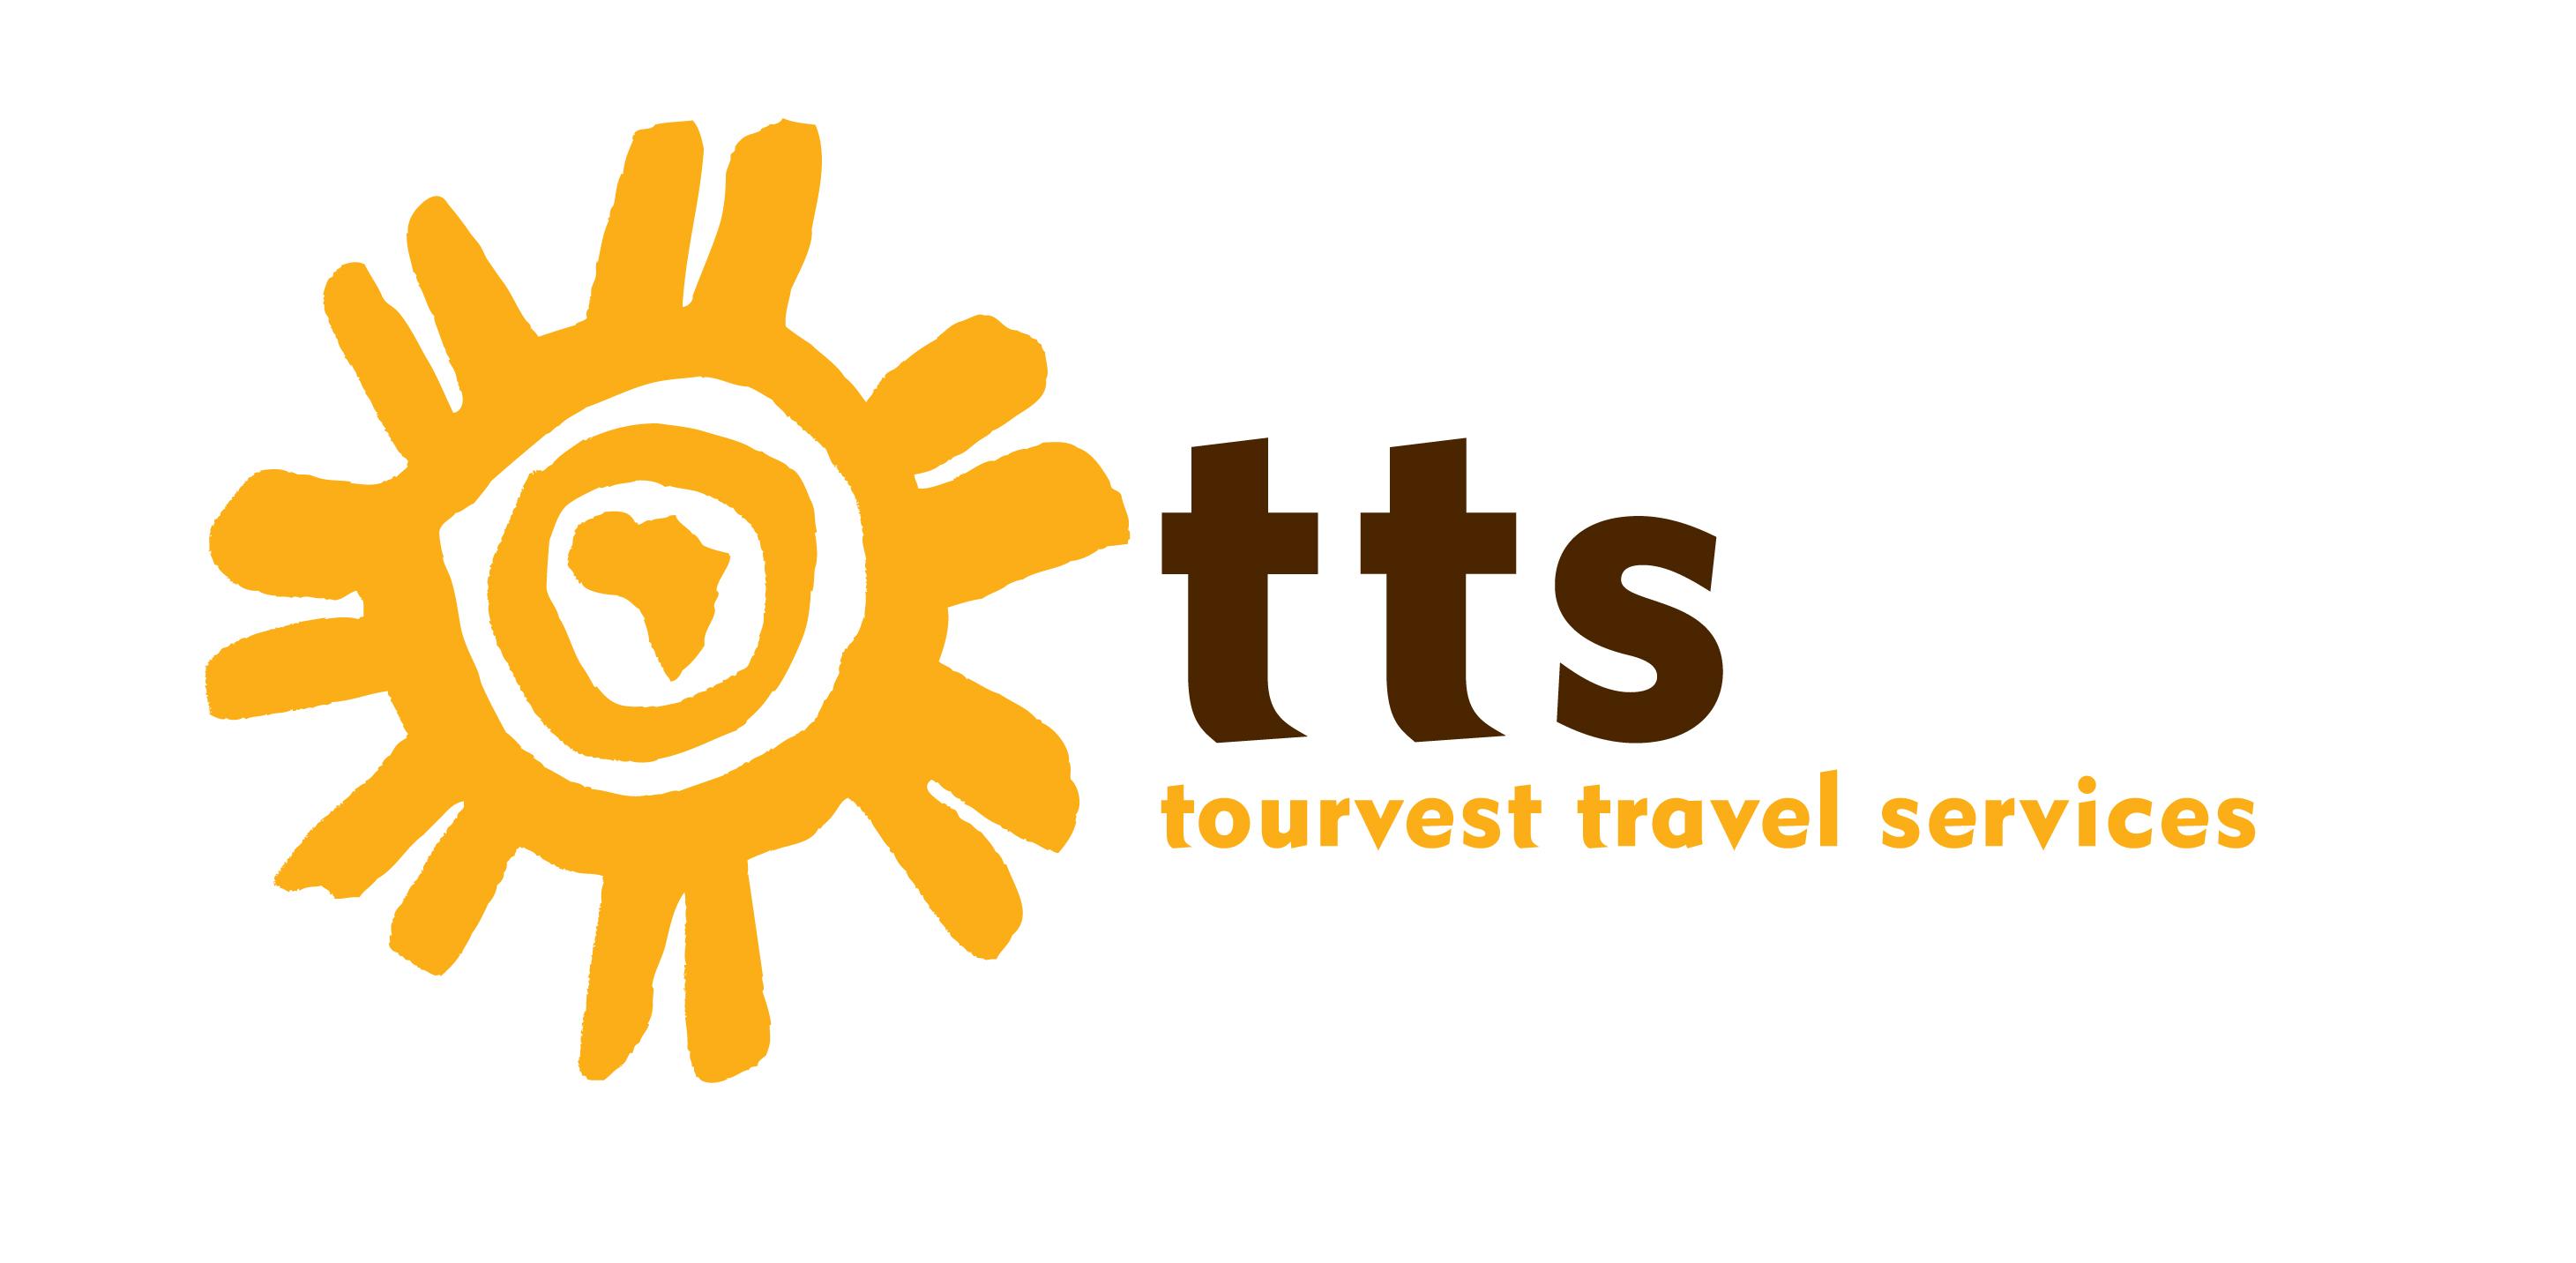 Tourvest Travel Services (Pty) Ltd